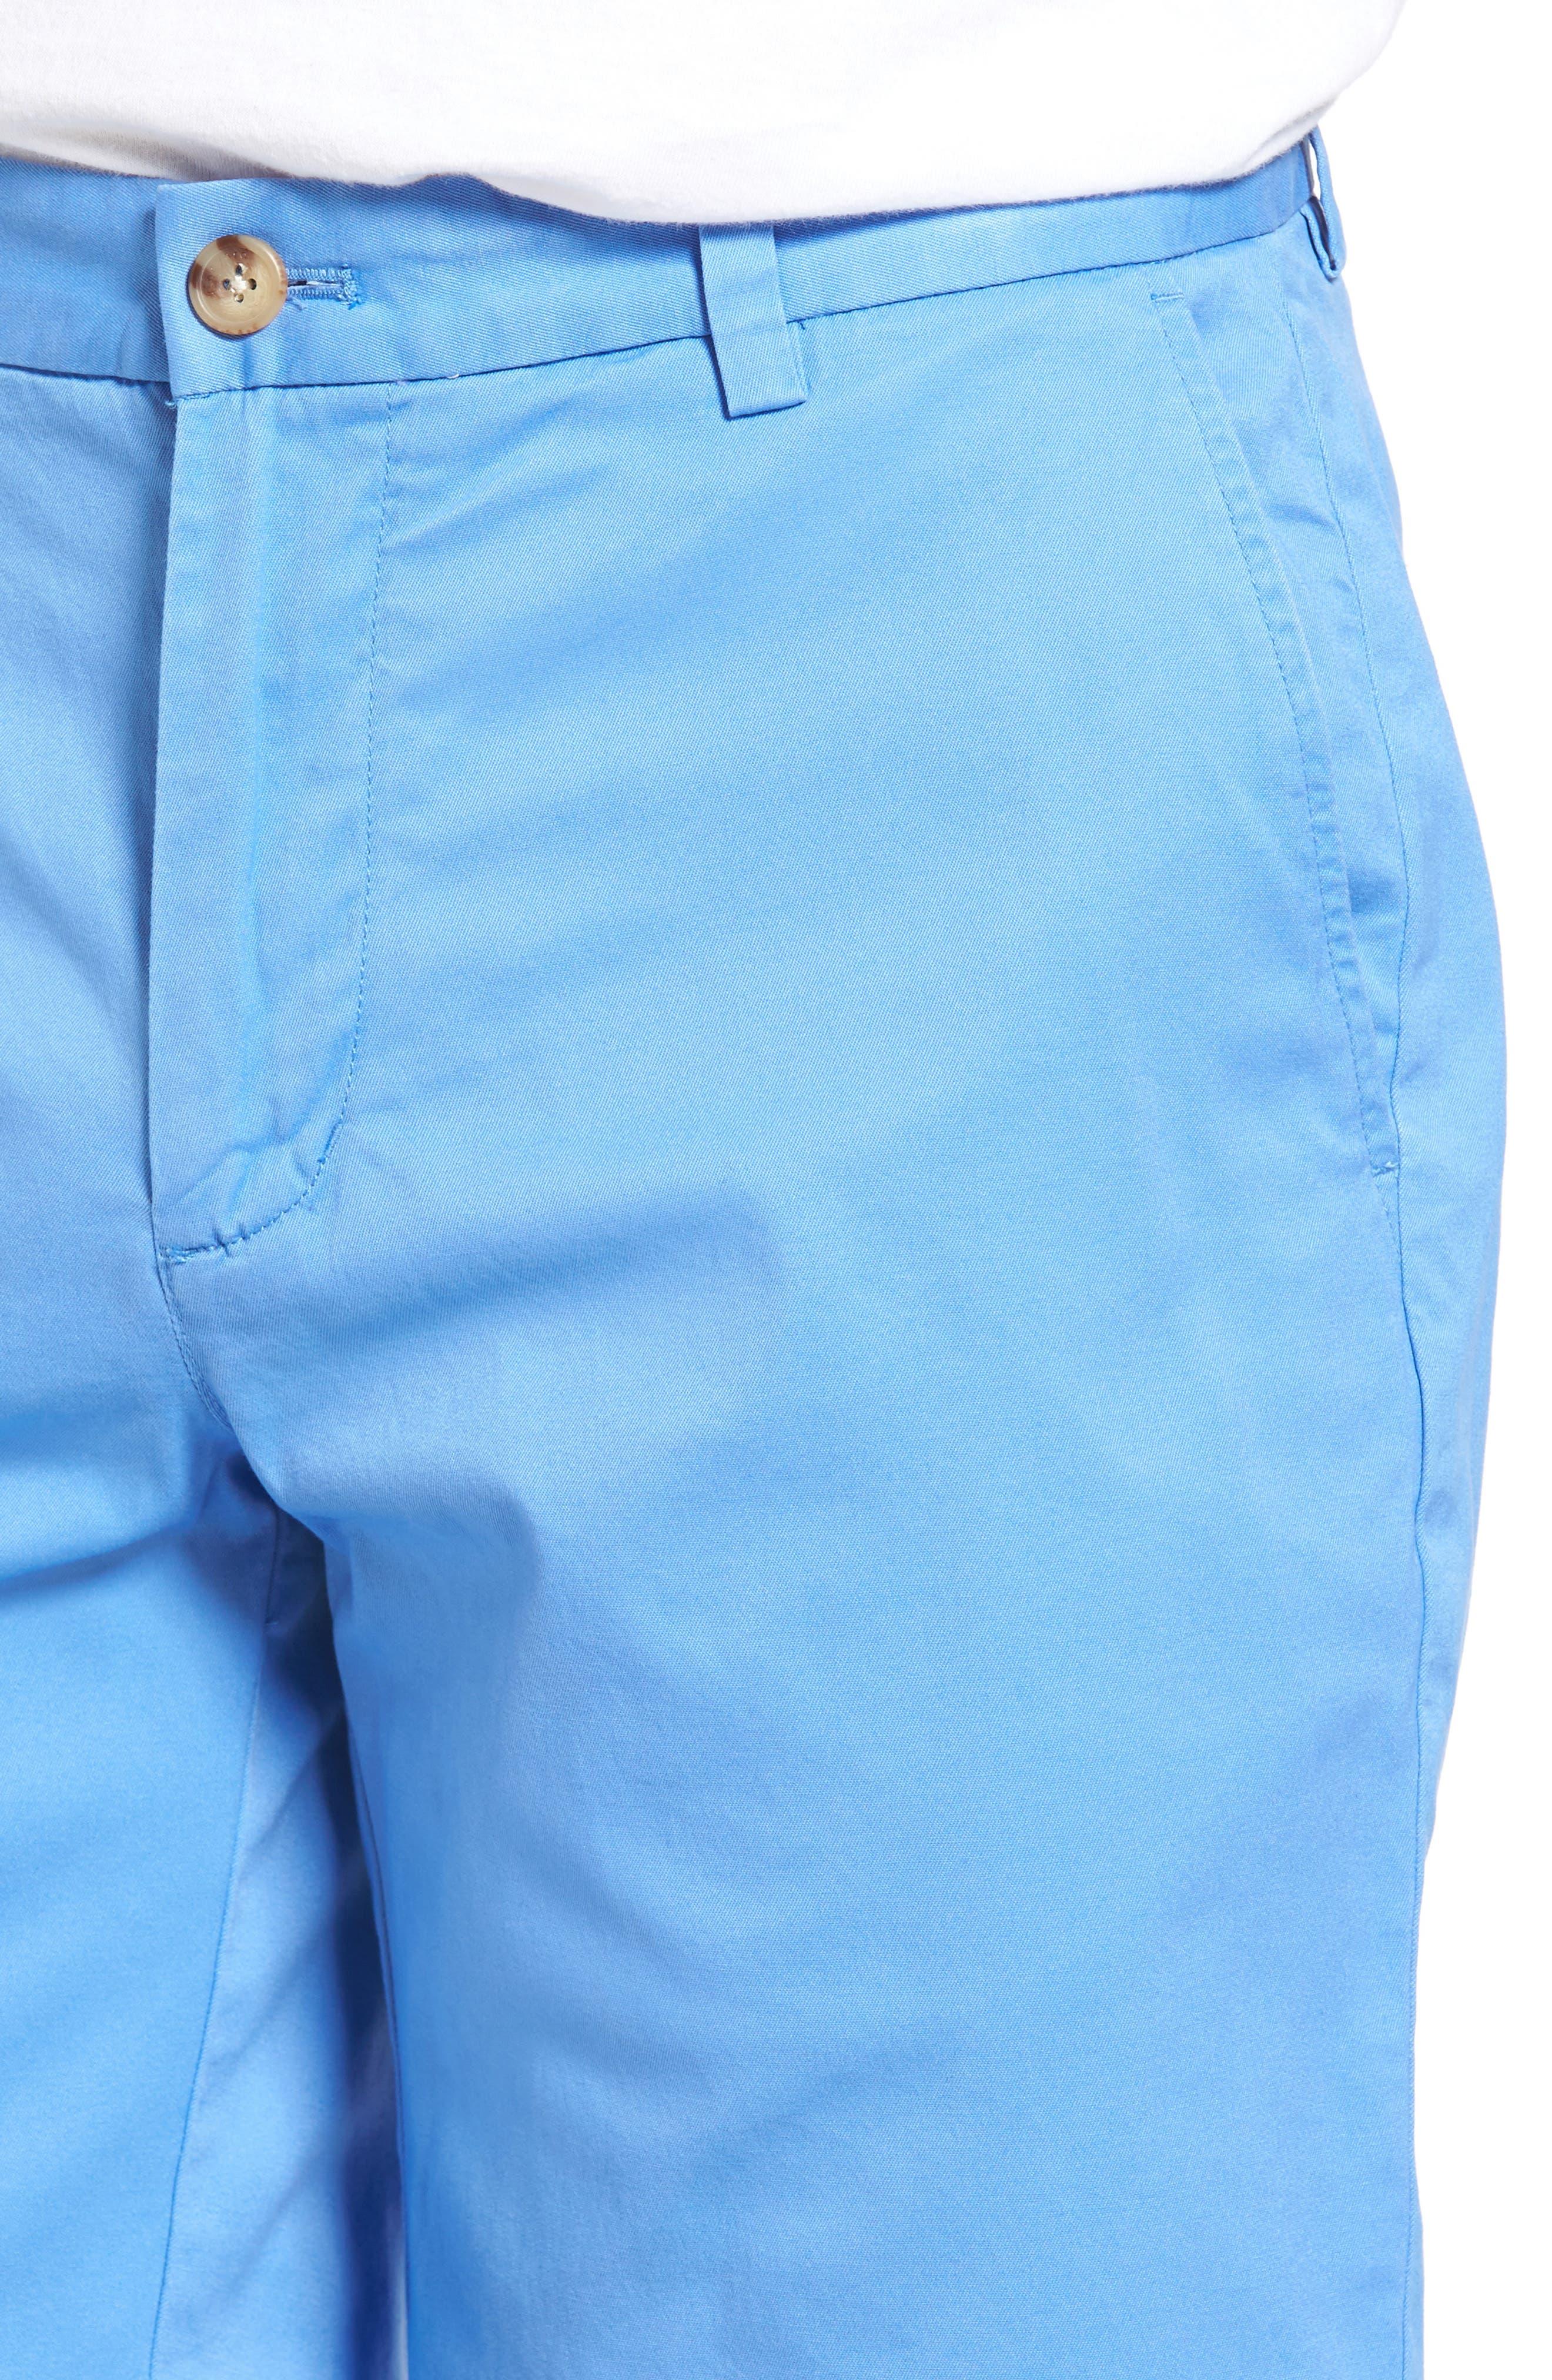 9 Inch Stretch Breaker Shorts,                             Alternate thumbnail 83, color,